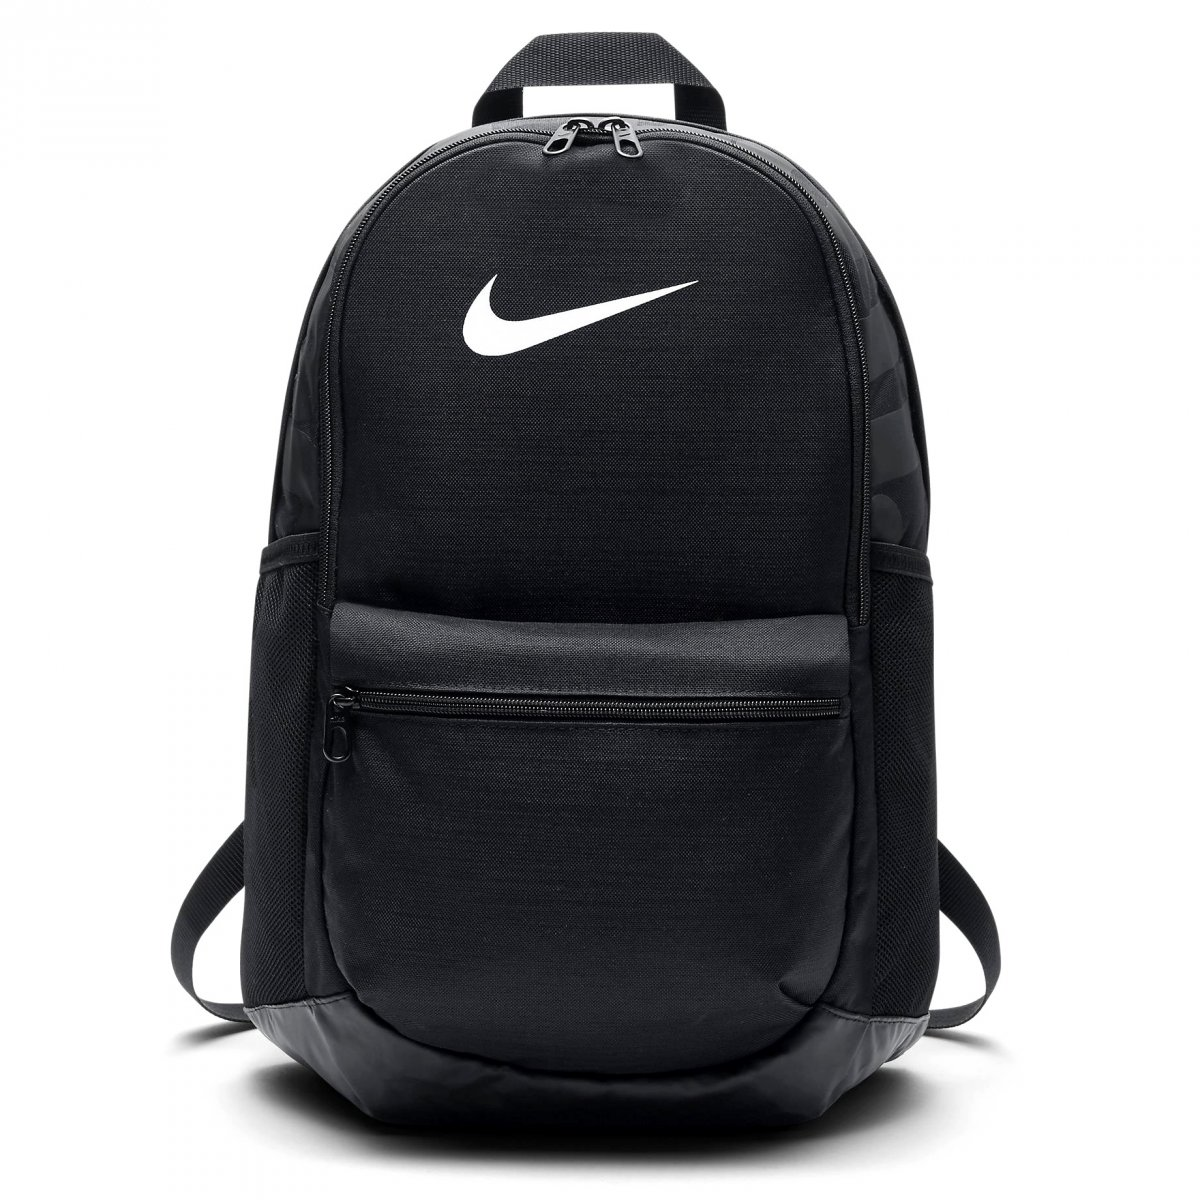 3fa457b54 Mochila Nike Brasilia BackPack (Média) BA5329-010 - Preto/Branco ...